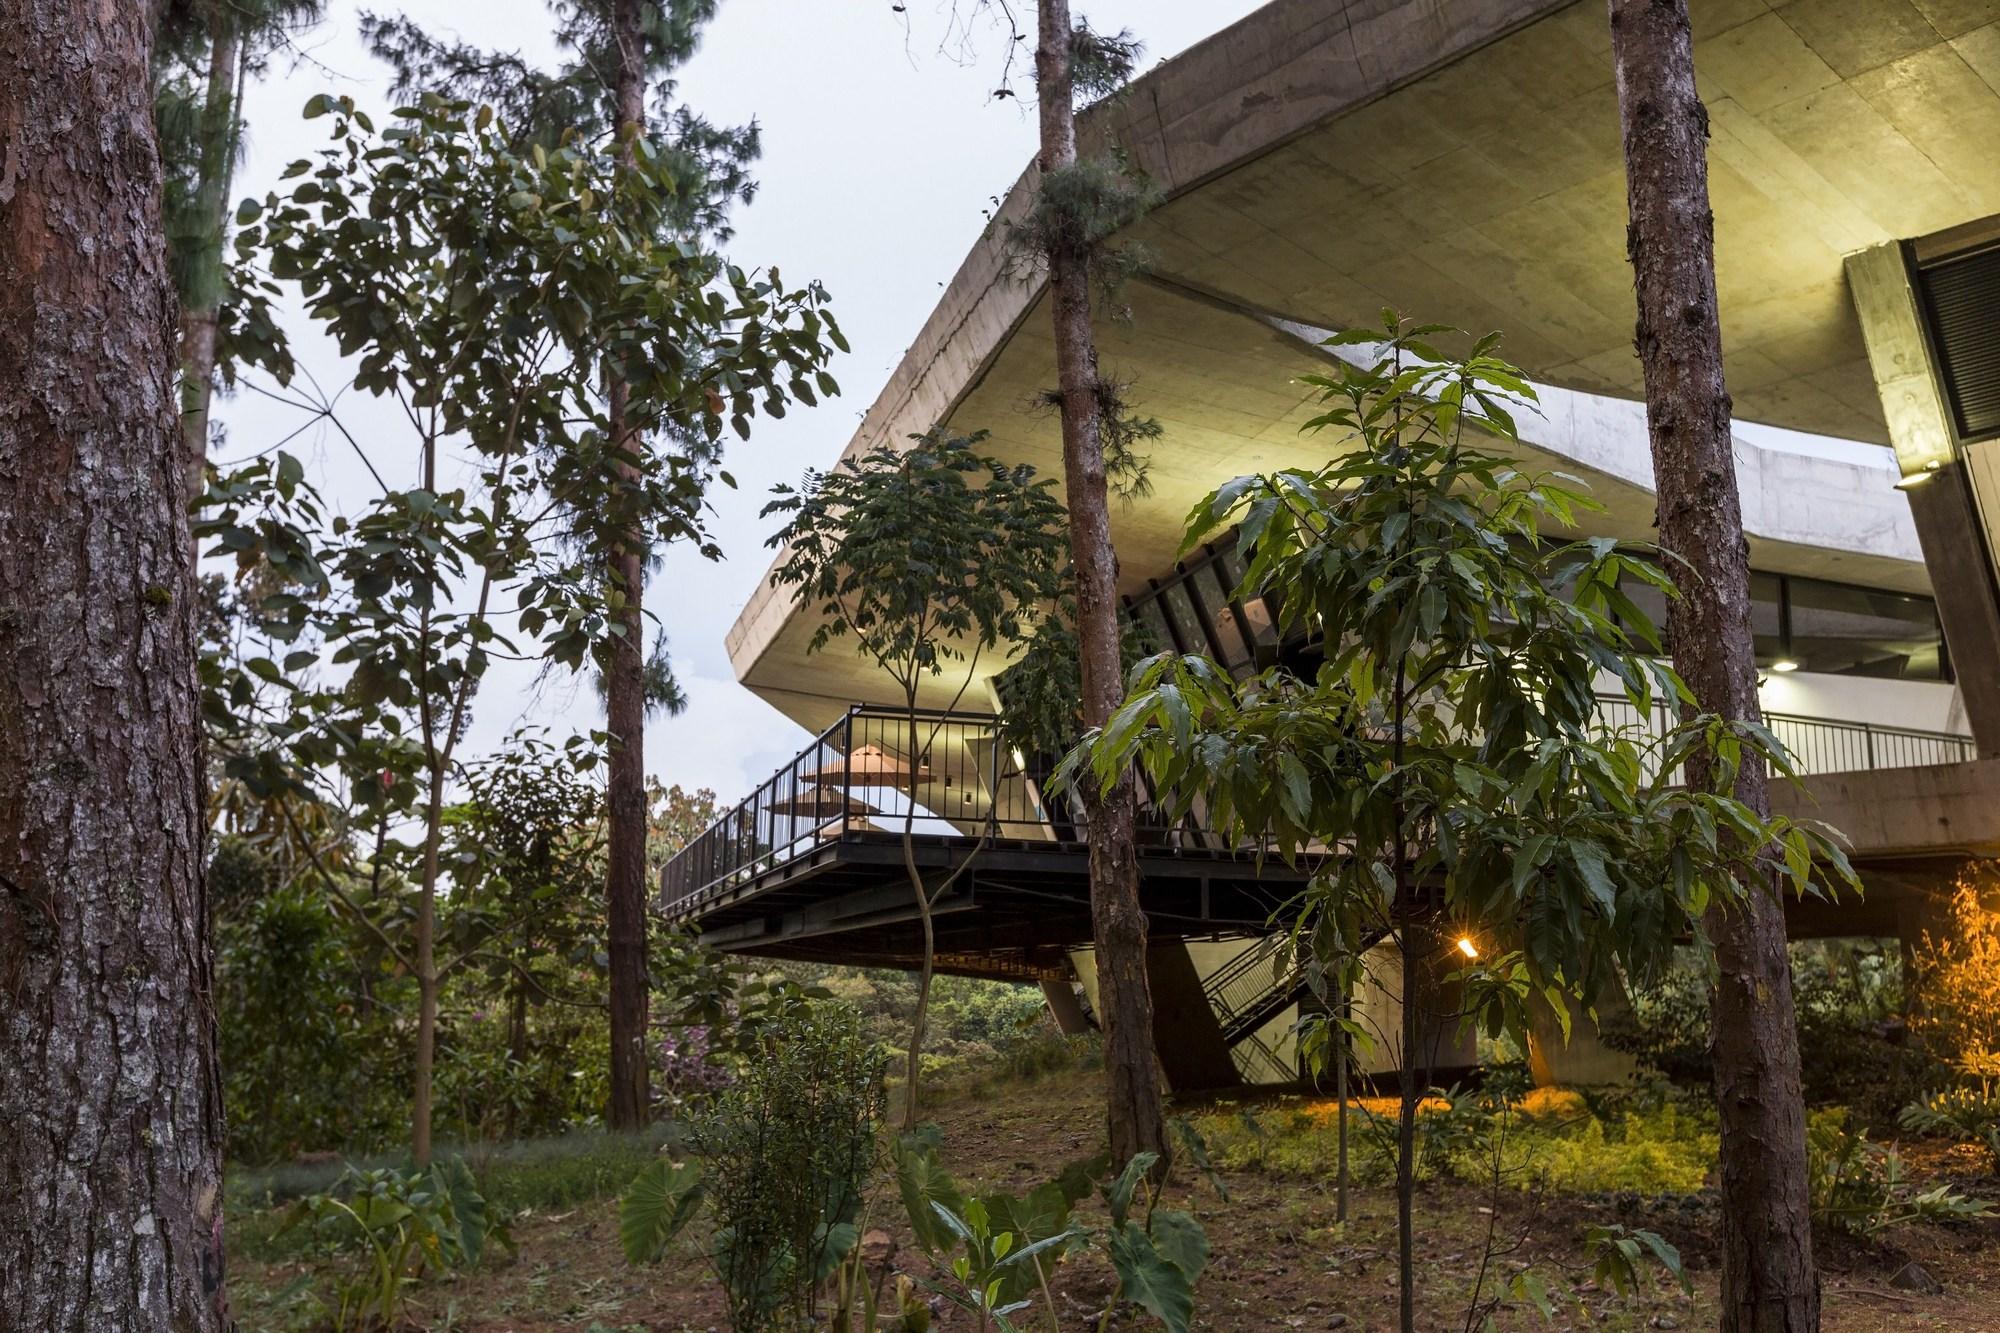 Silletas Park / Juan Felipe Uribe de Bedout